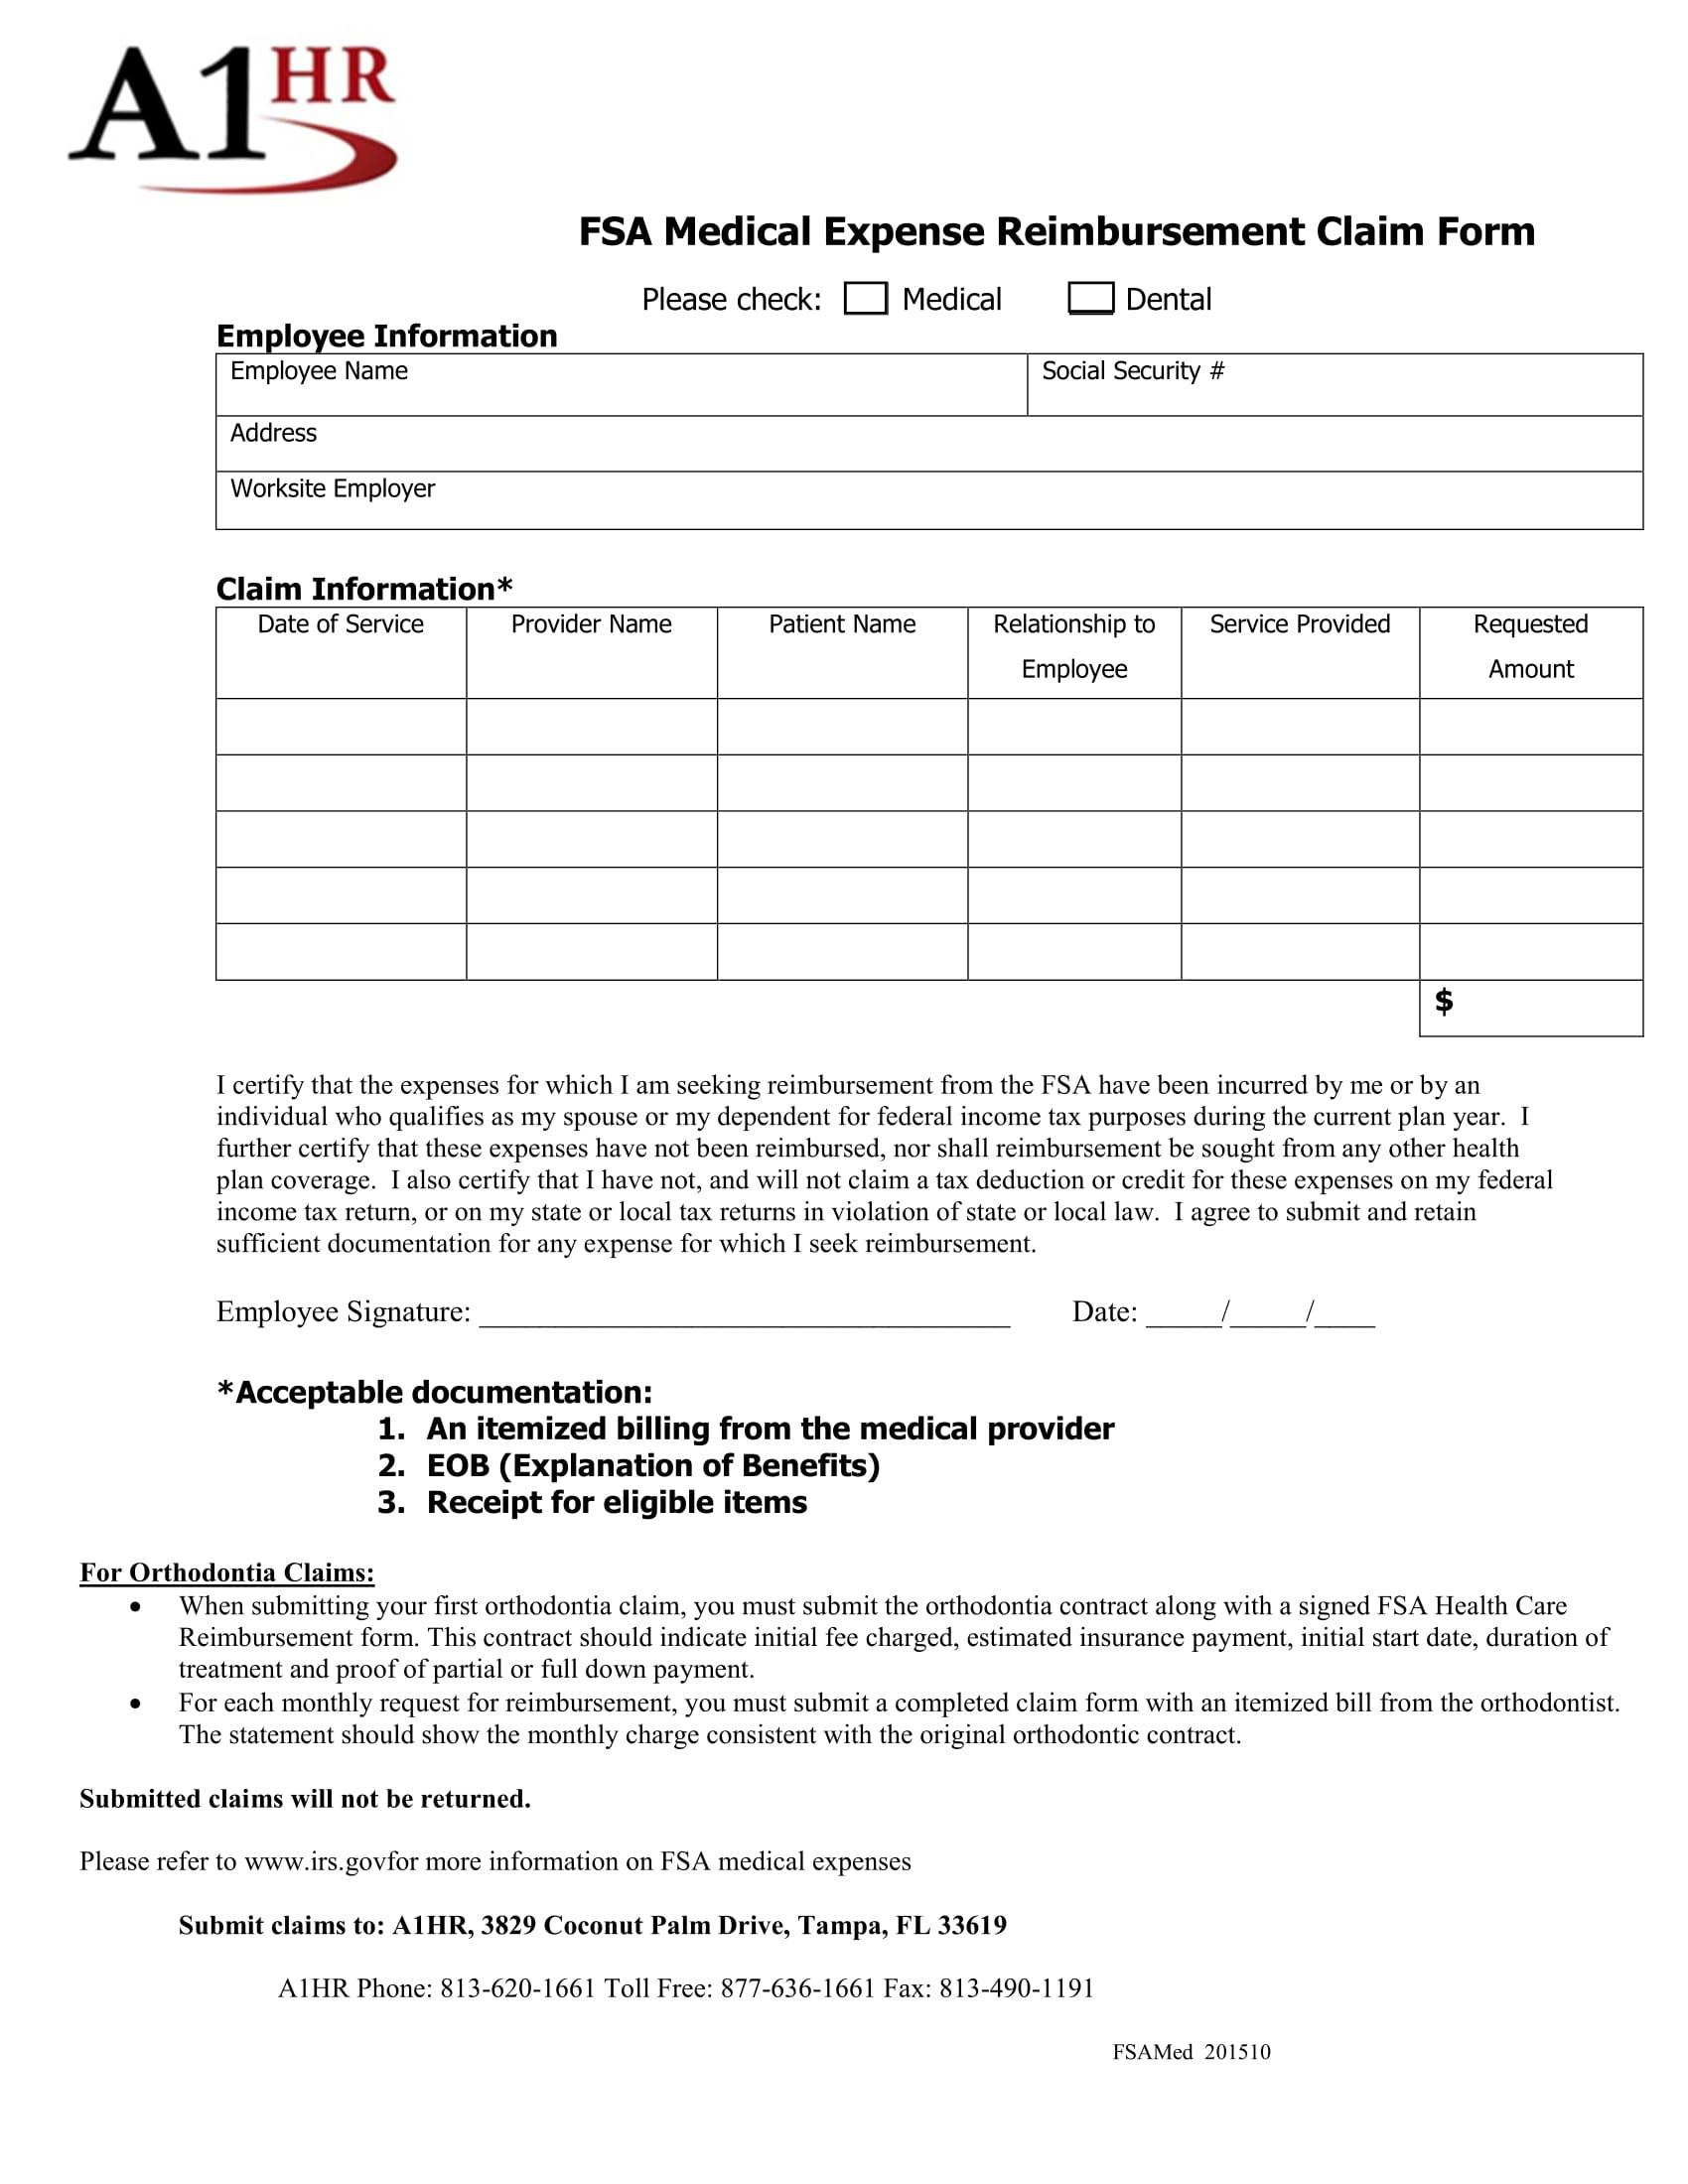 medical expense reimbursement claim form 1